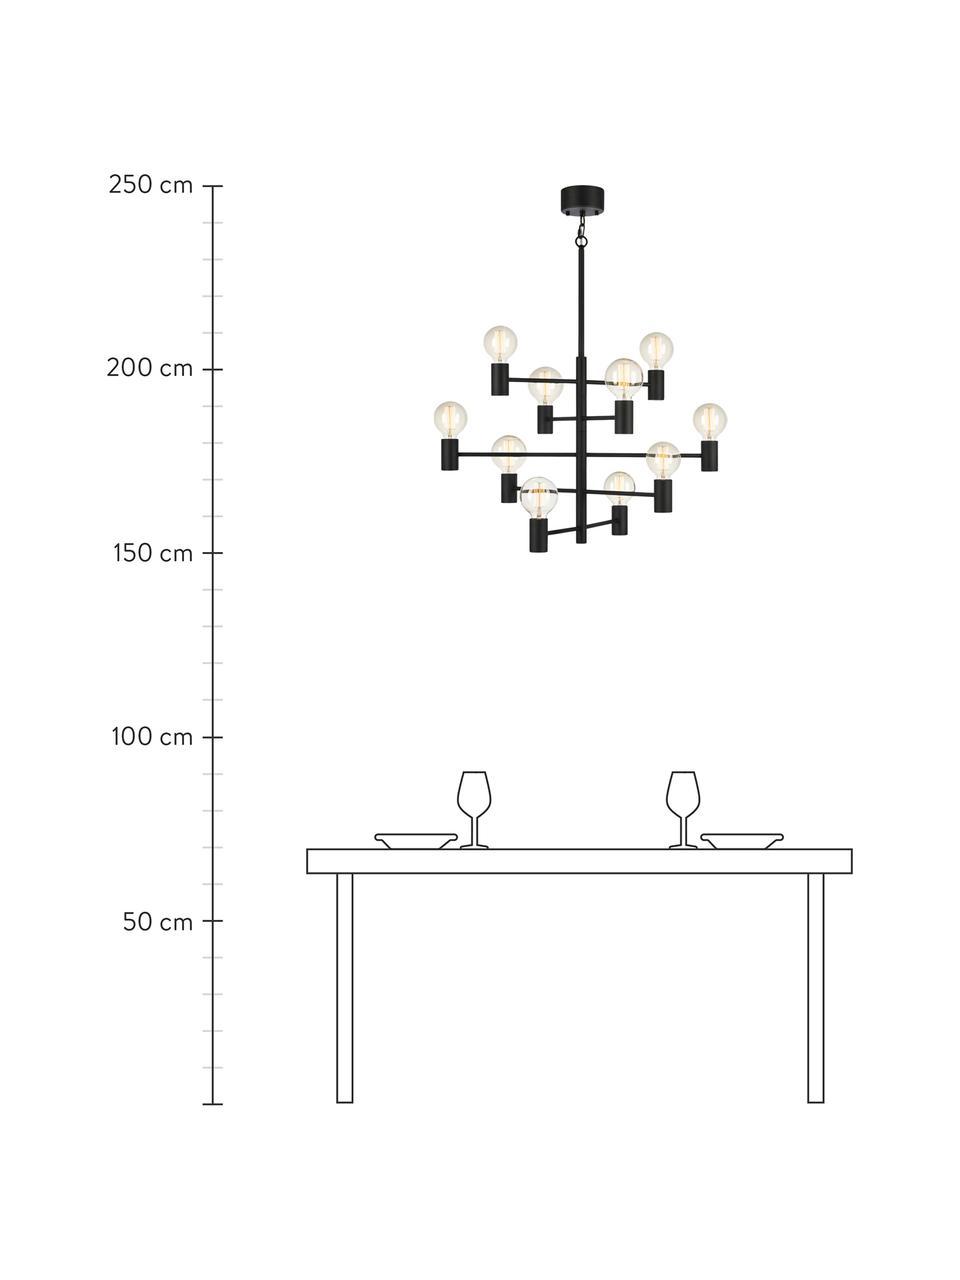 Grote kroonluchter Paris, Gelakt messing, Lamp: zwart. Snoer: transparant, Ø 80 cm